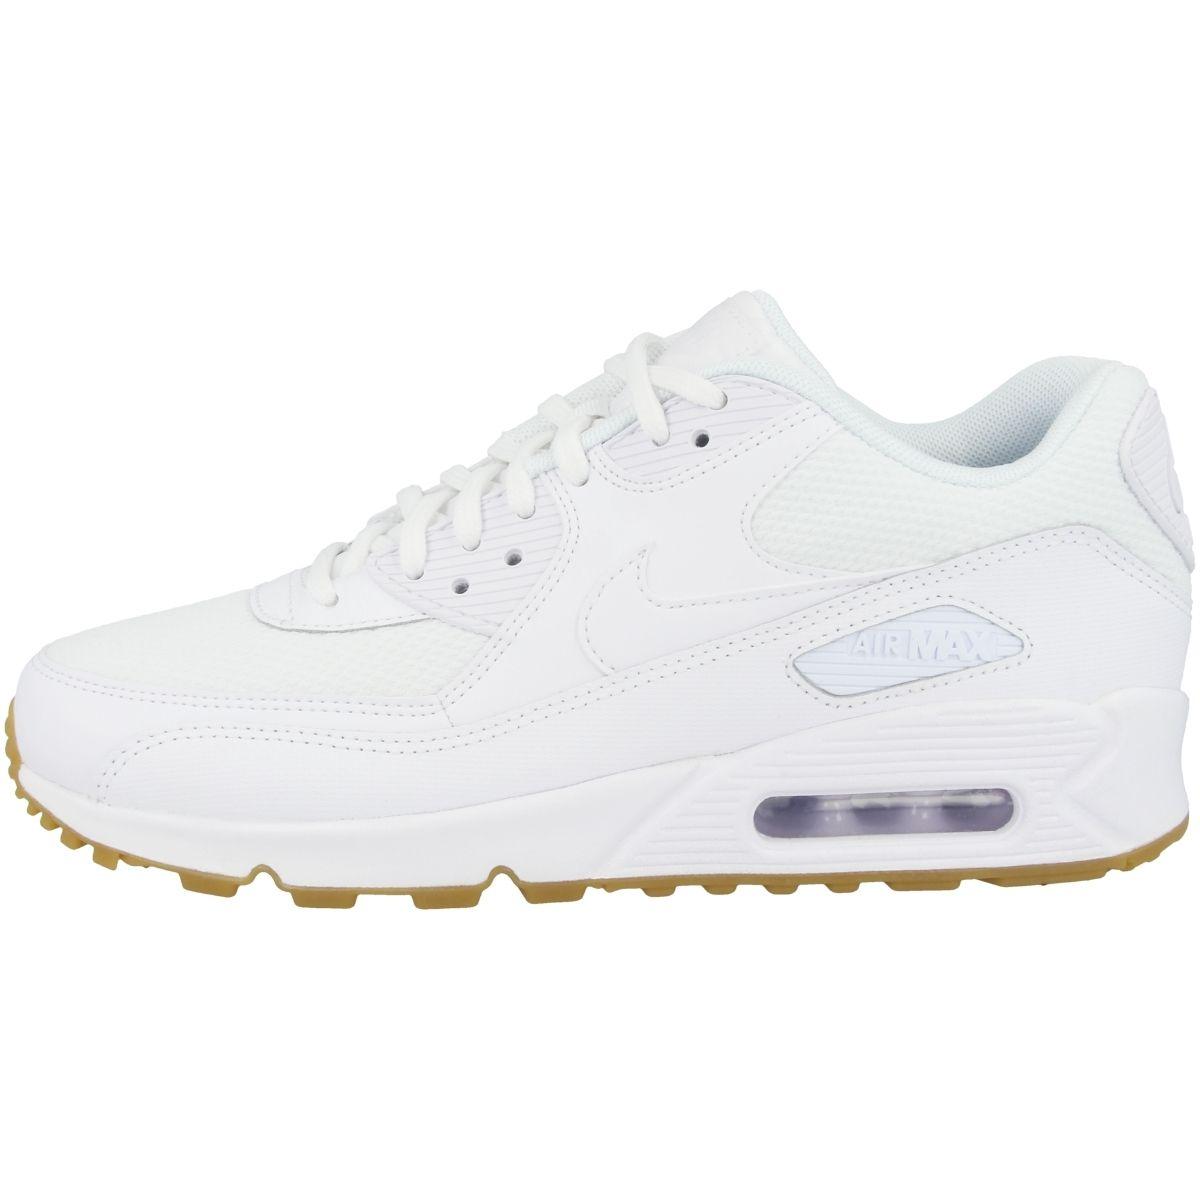 nike frauen schuhe ebay,ebay Frauen Schuhe Nike Sportswear